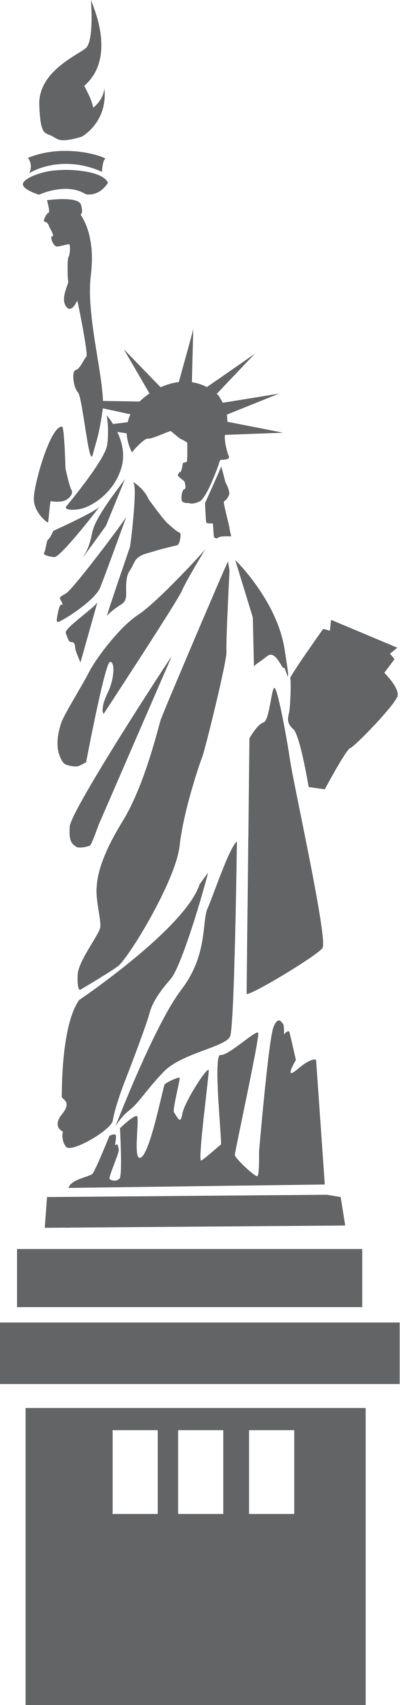 Drawn statue of liberty libert Statue Liberty with of transparent